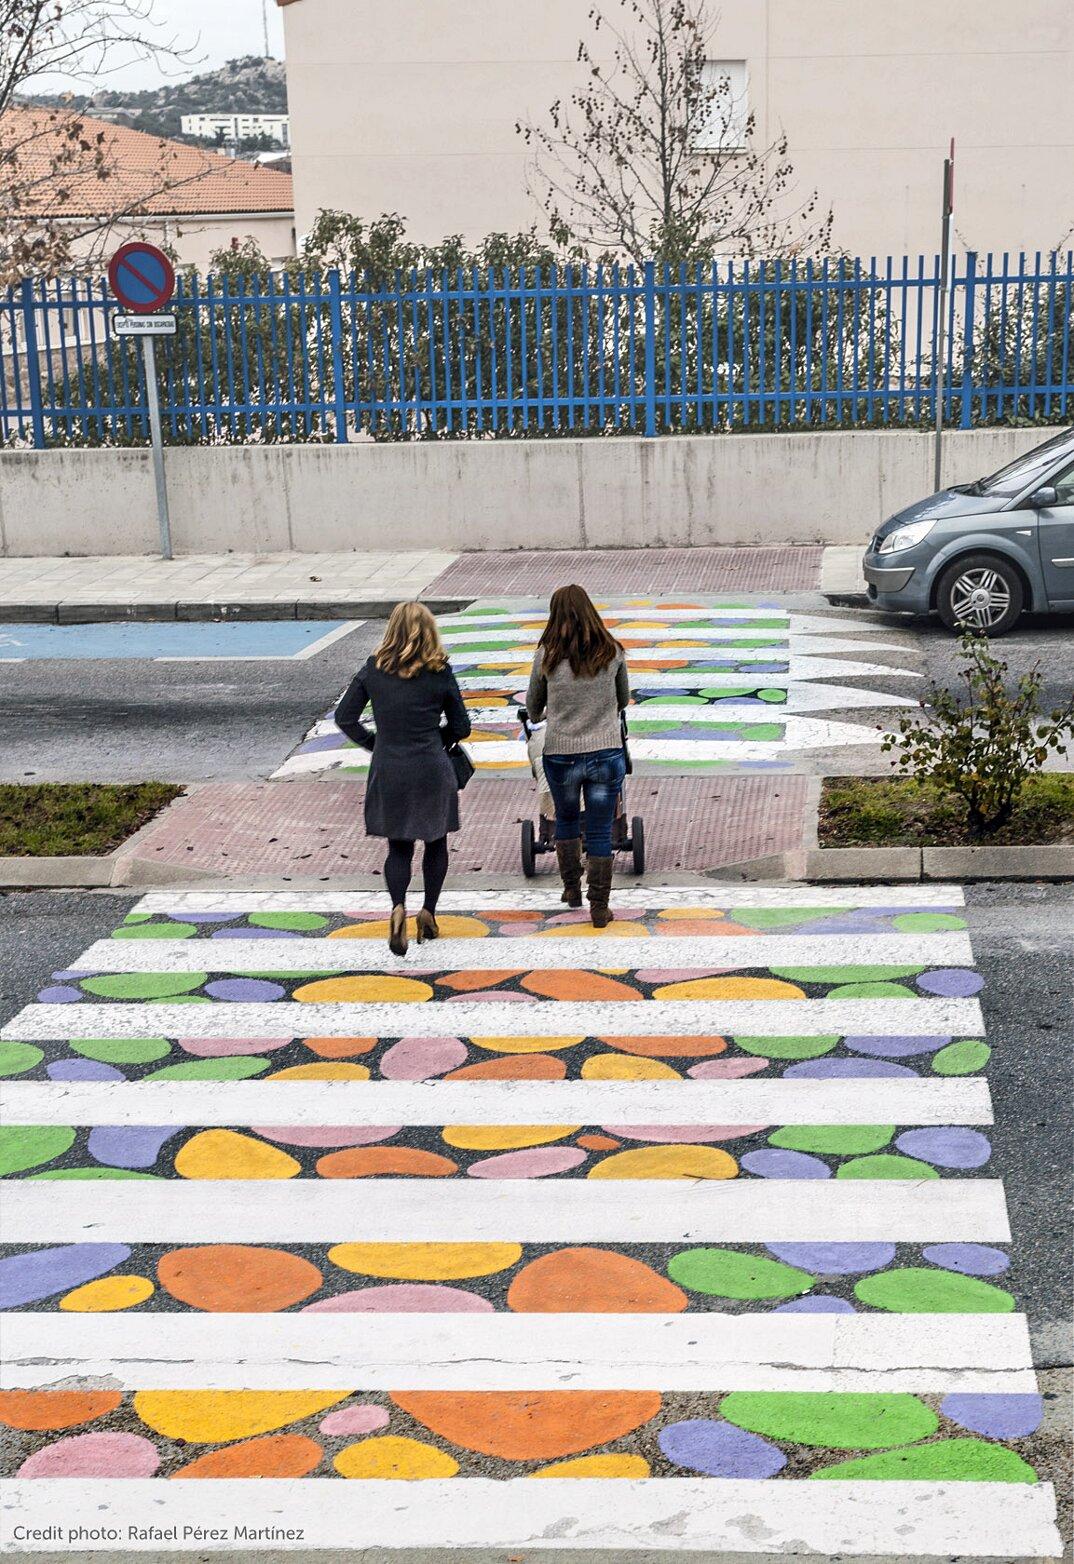 strisce-pedonali-decorate-arte-christo-guelov-funnycross-madrid-25